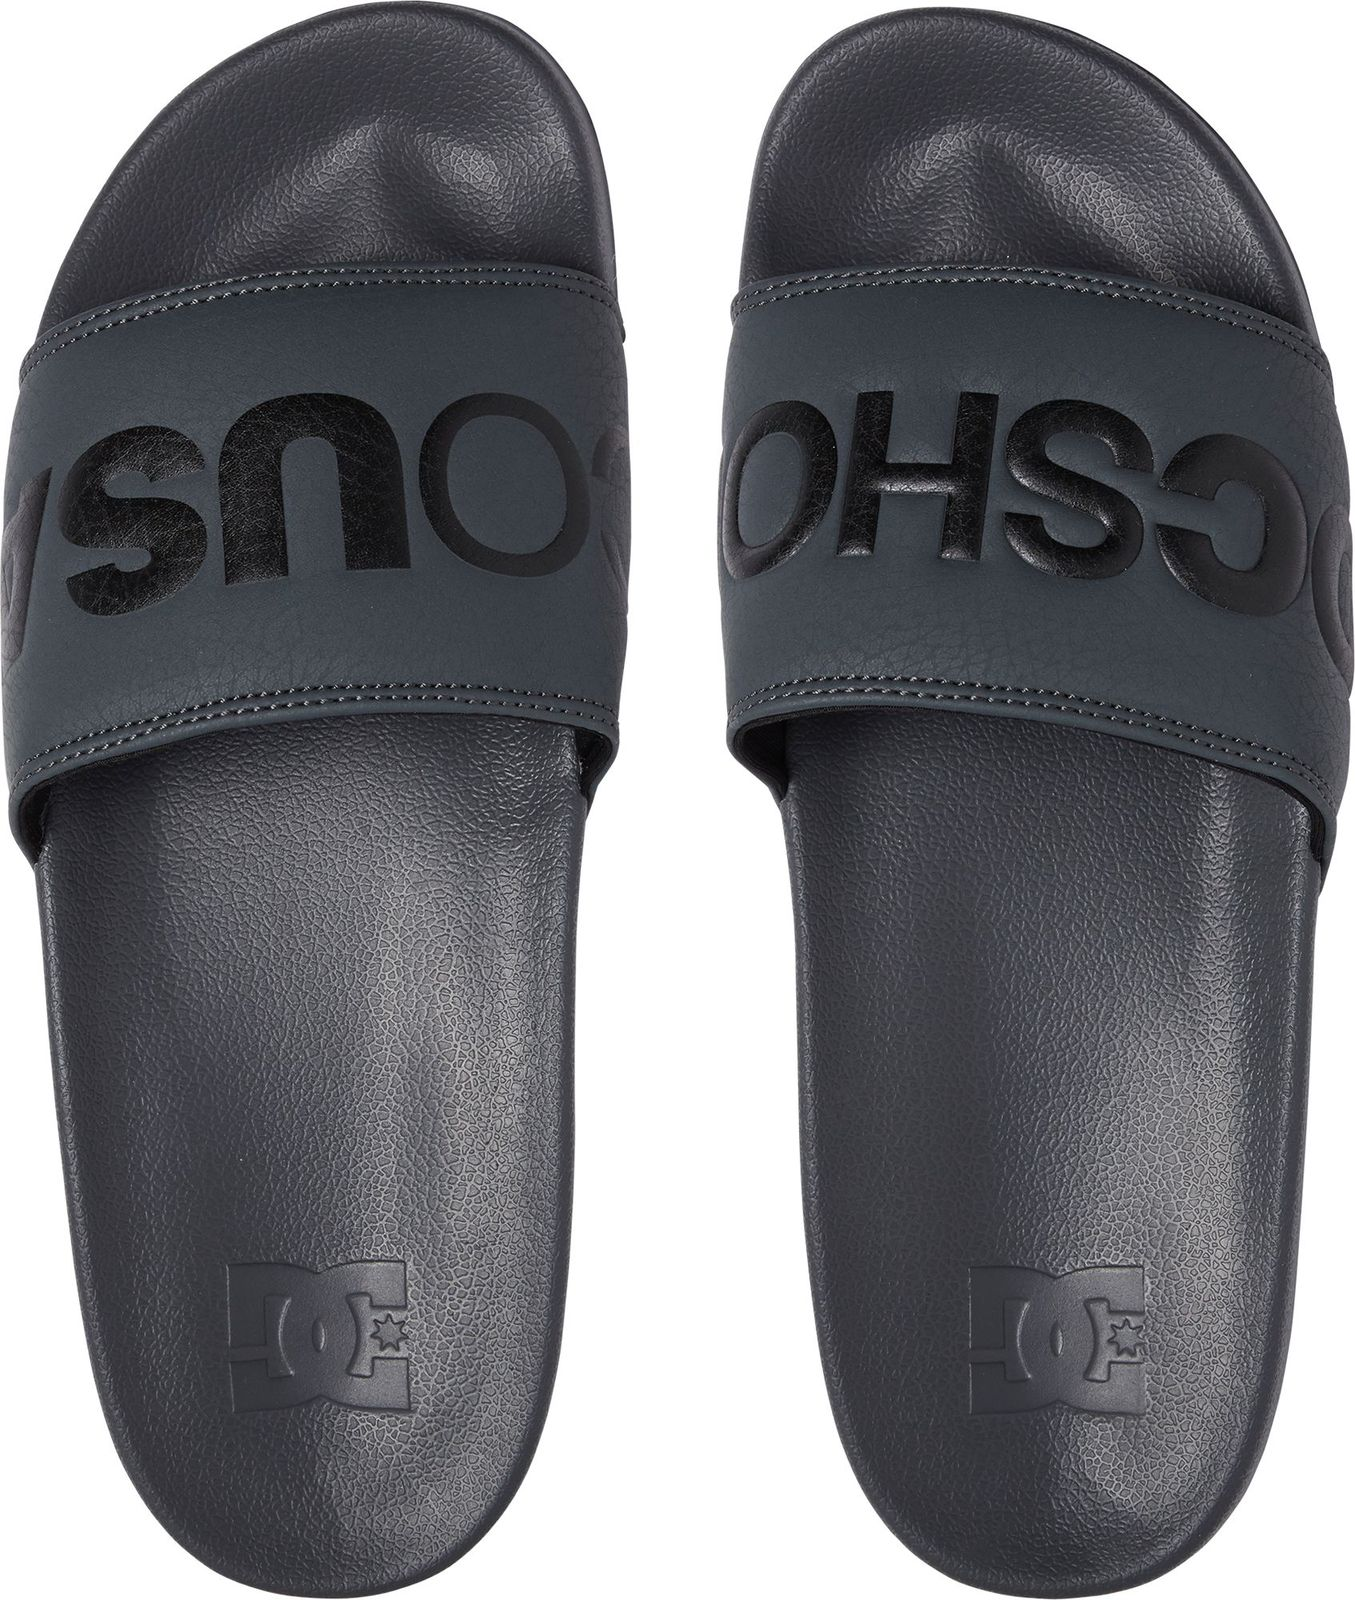 цена Шлепанцы DC Shoes онлайн в 2017 году